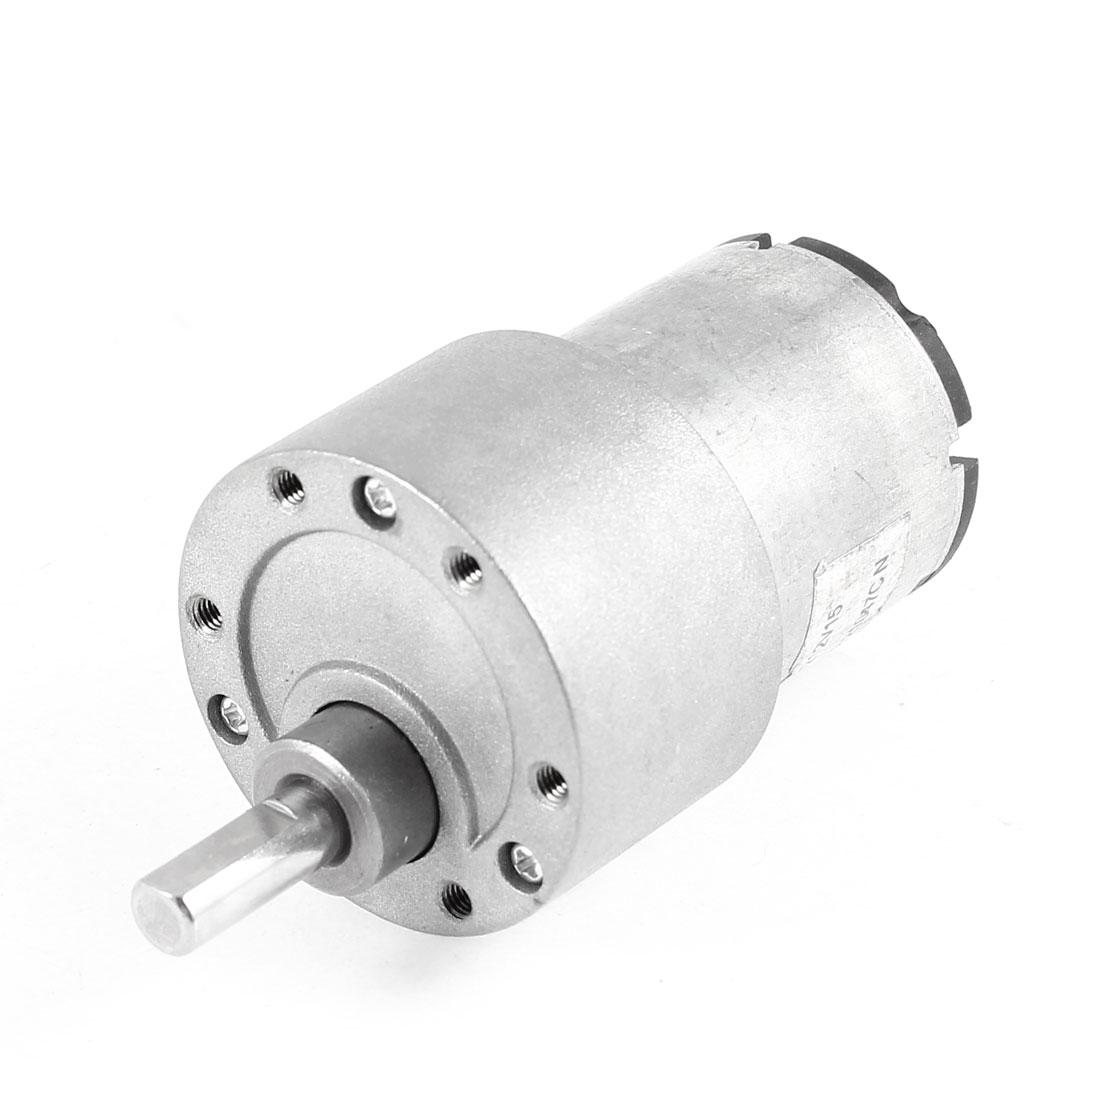 DC 12V 180RPM 5Kg.cm Torque 6mm Dia Shaft Electric Gear Box Speed Reducing Motor